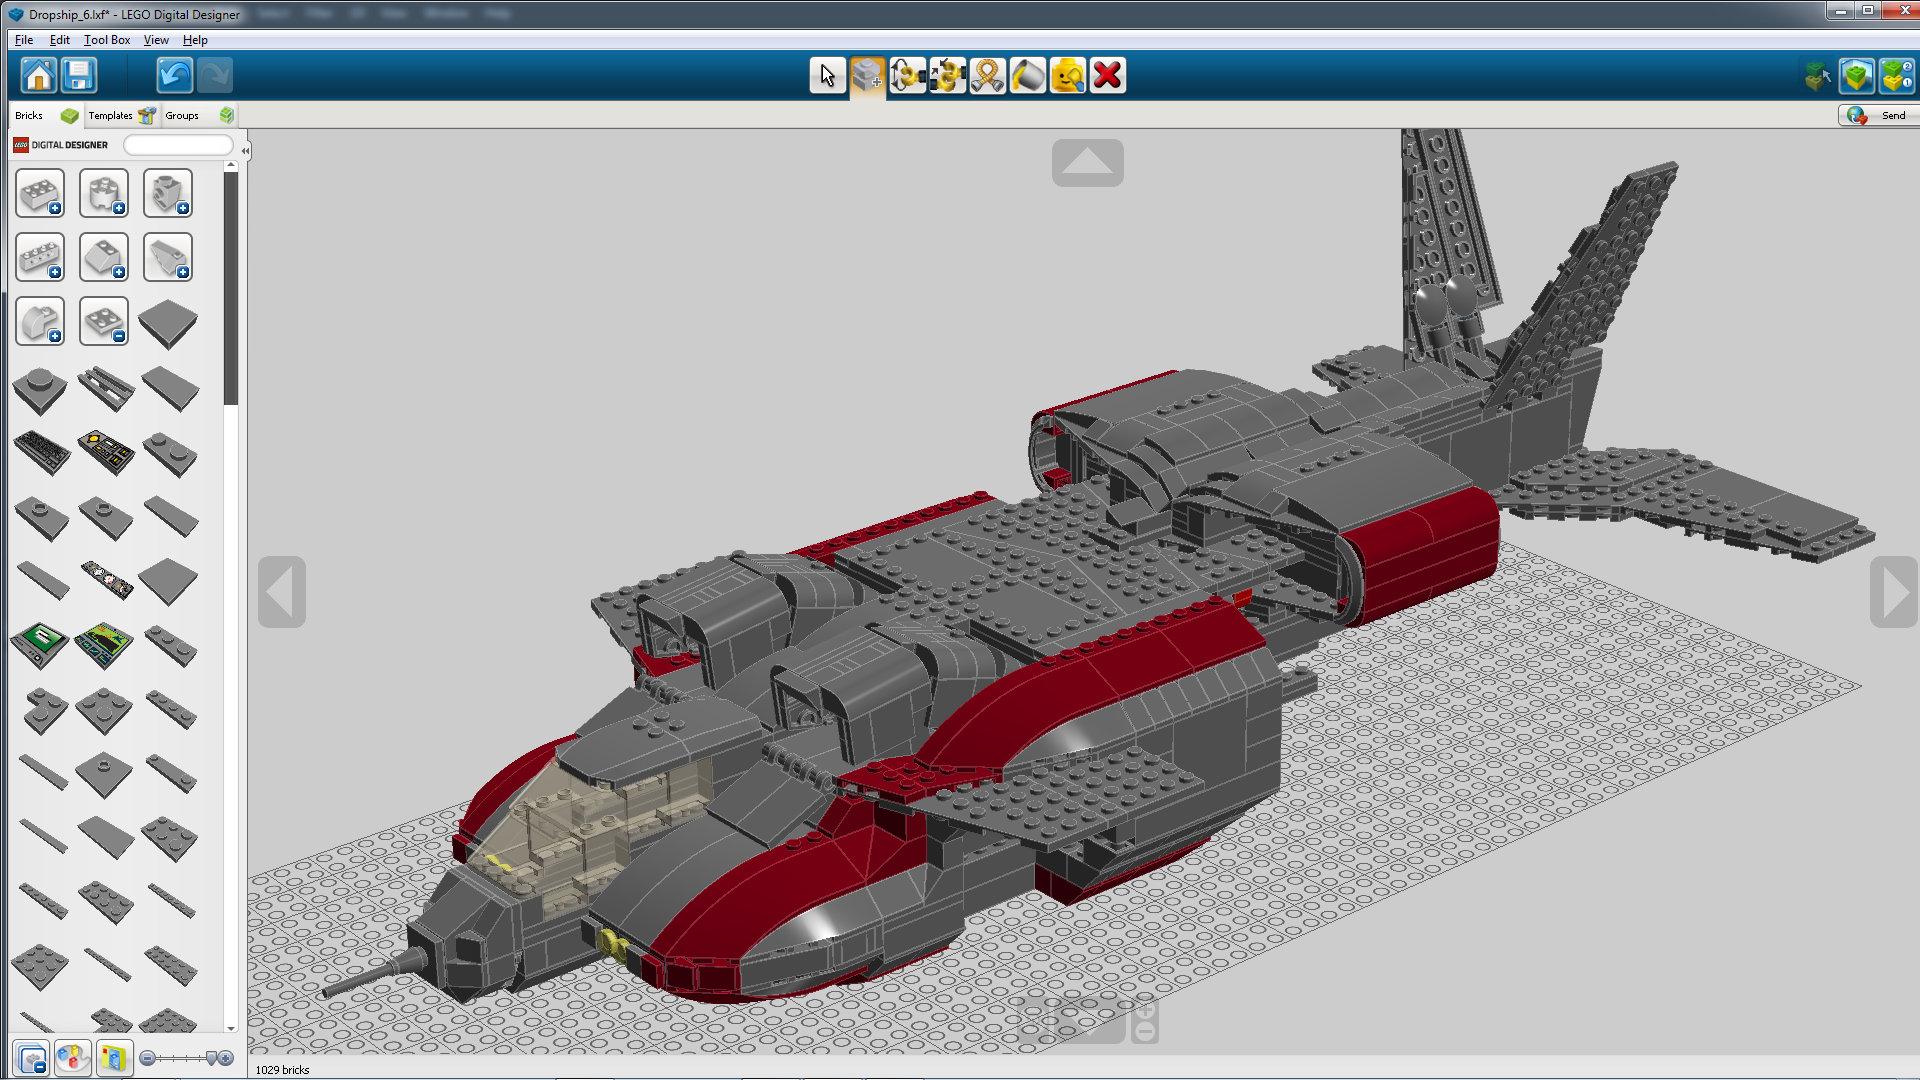 Screen shot of Lego Dropship built in Lego Digital Designer